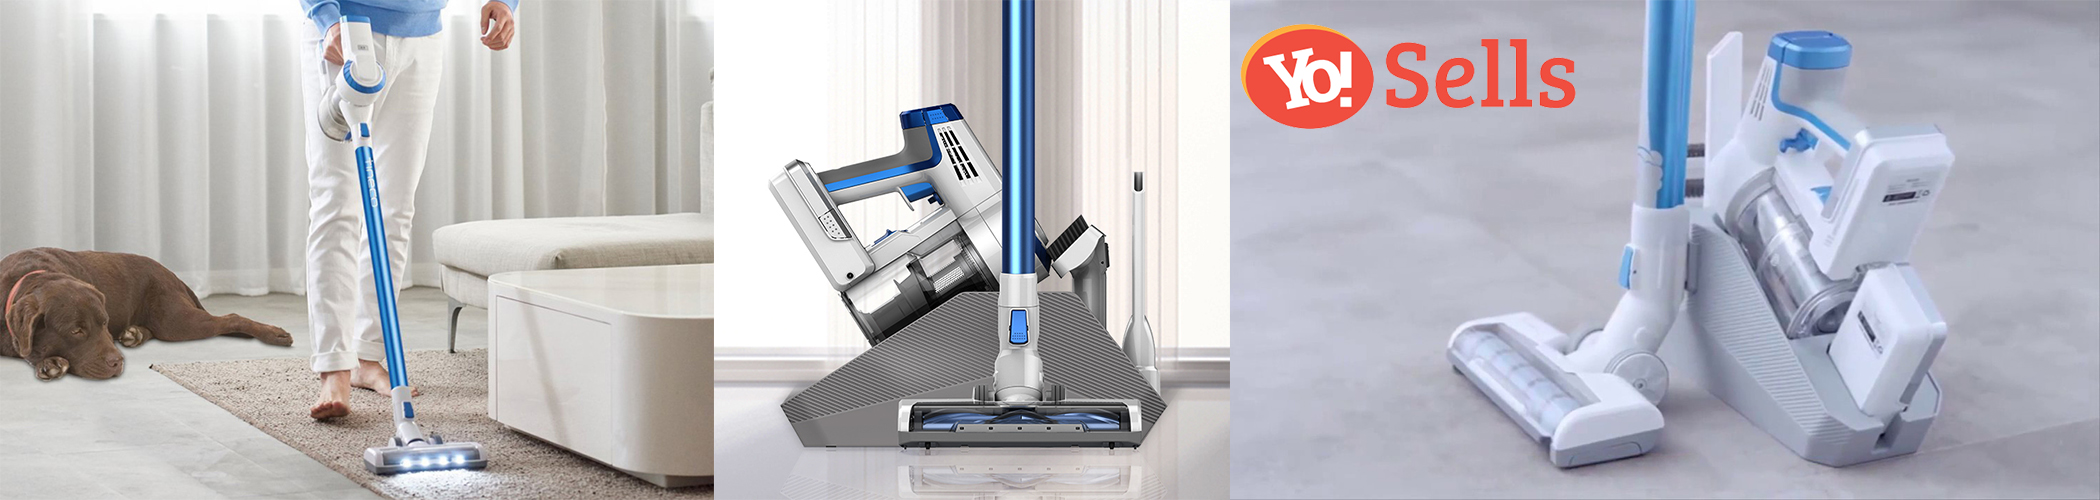 Tineco A10 Hero 350W Cordless Vacuum Cleaner